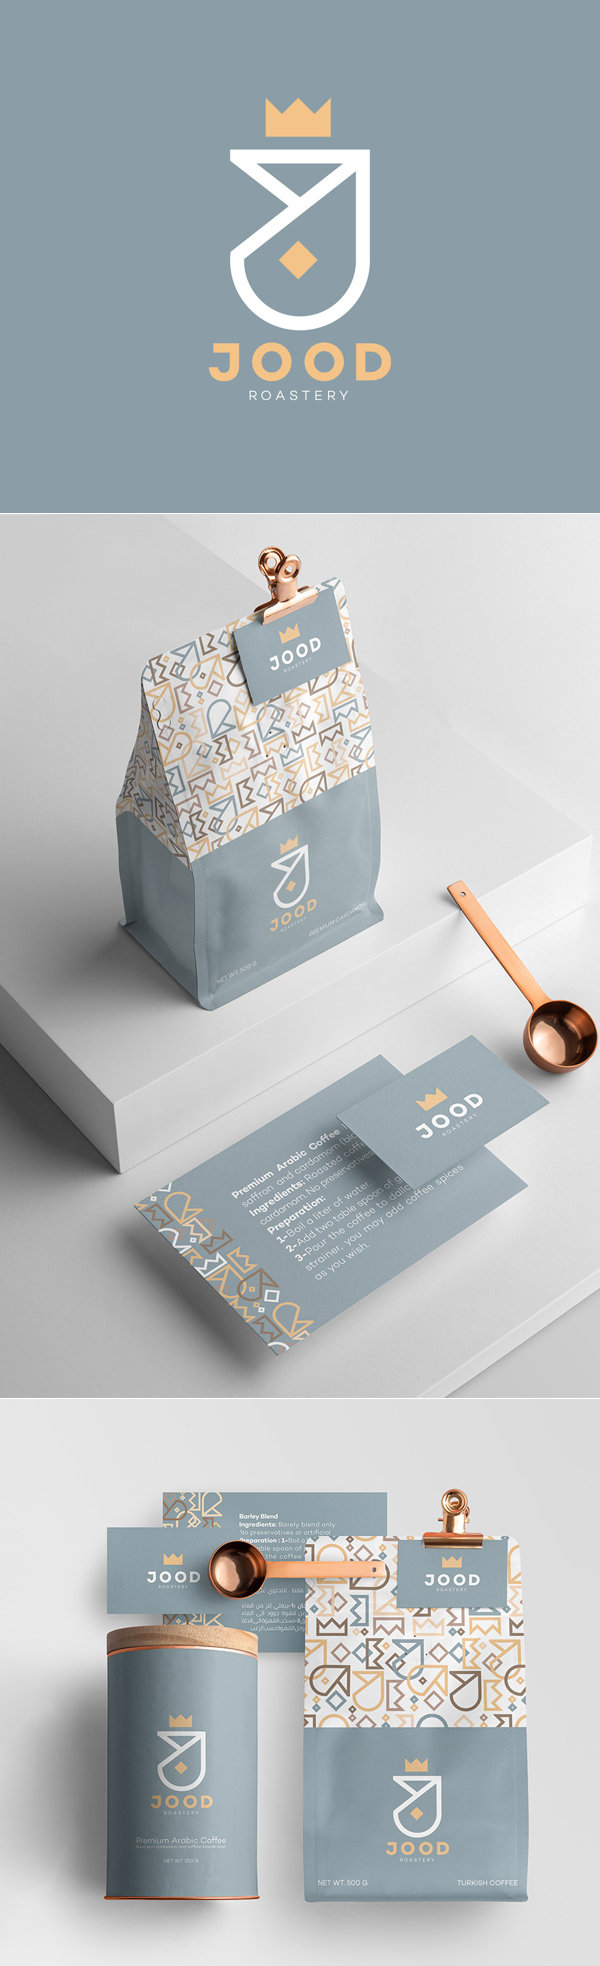 JOOD Branding Identity by Kinda Ghannoum